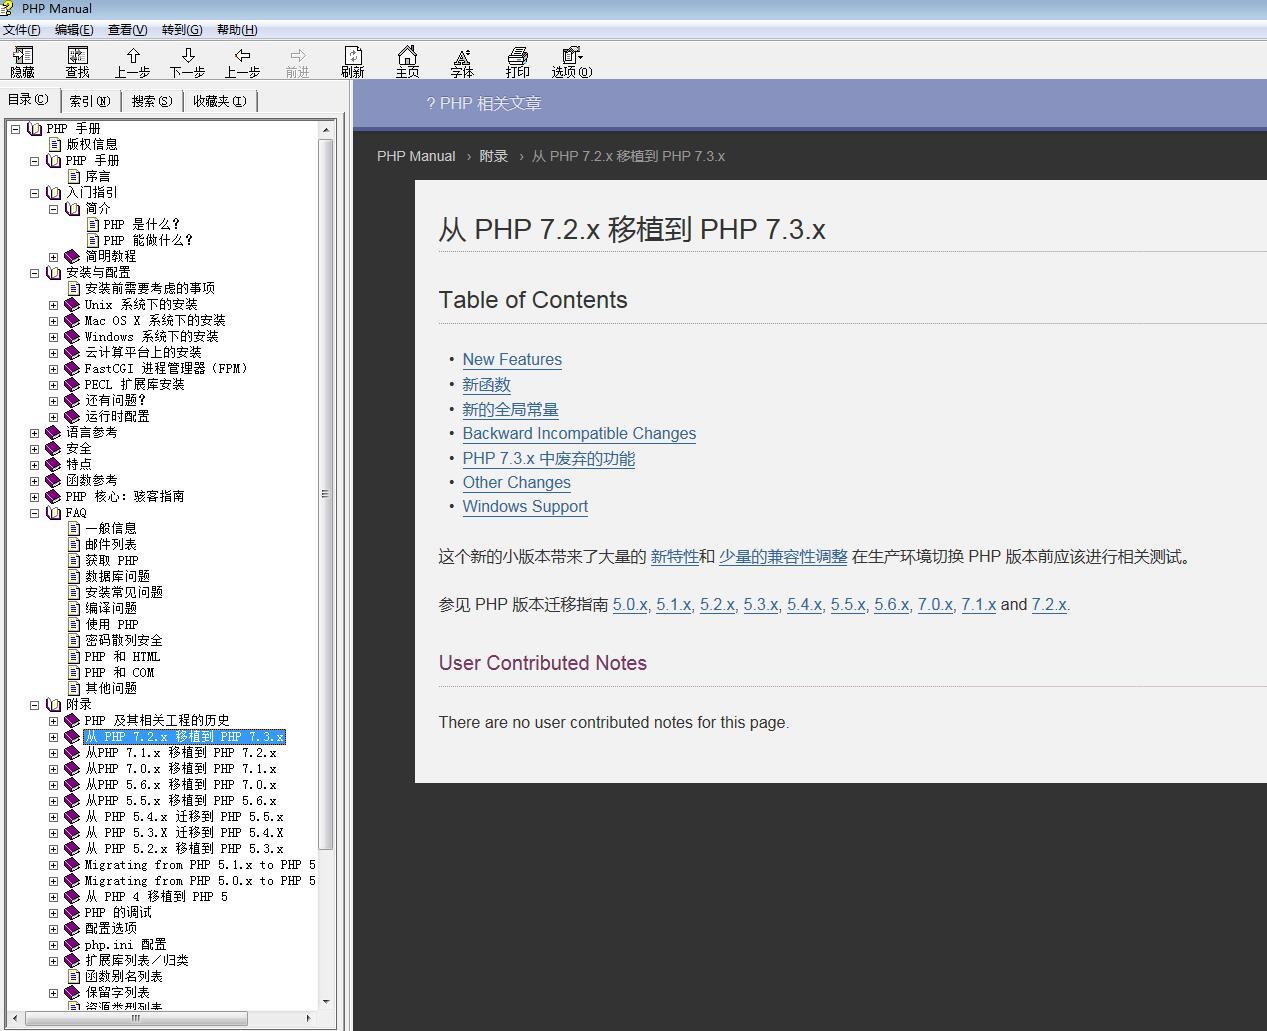 php7.3.8离线中文手册(官方版)